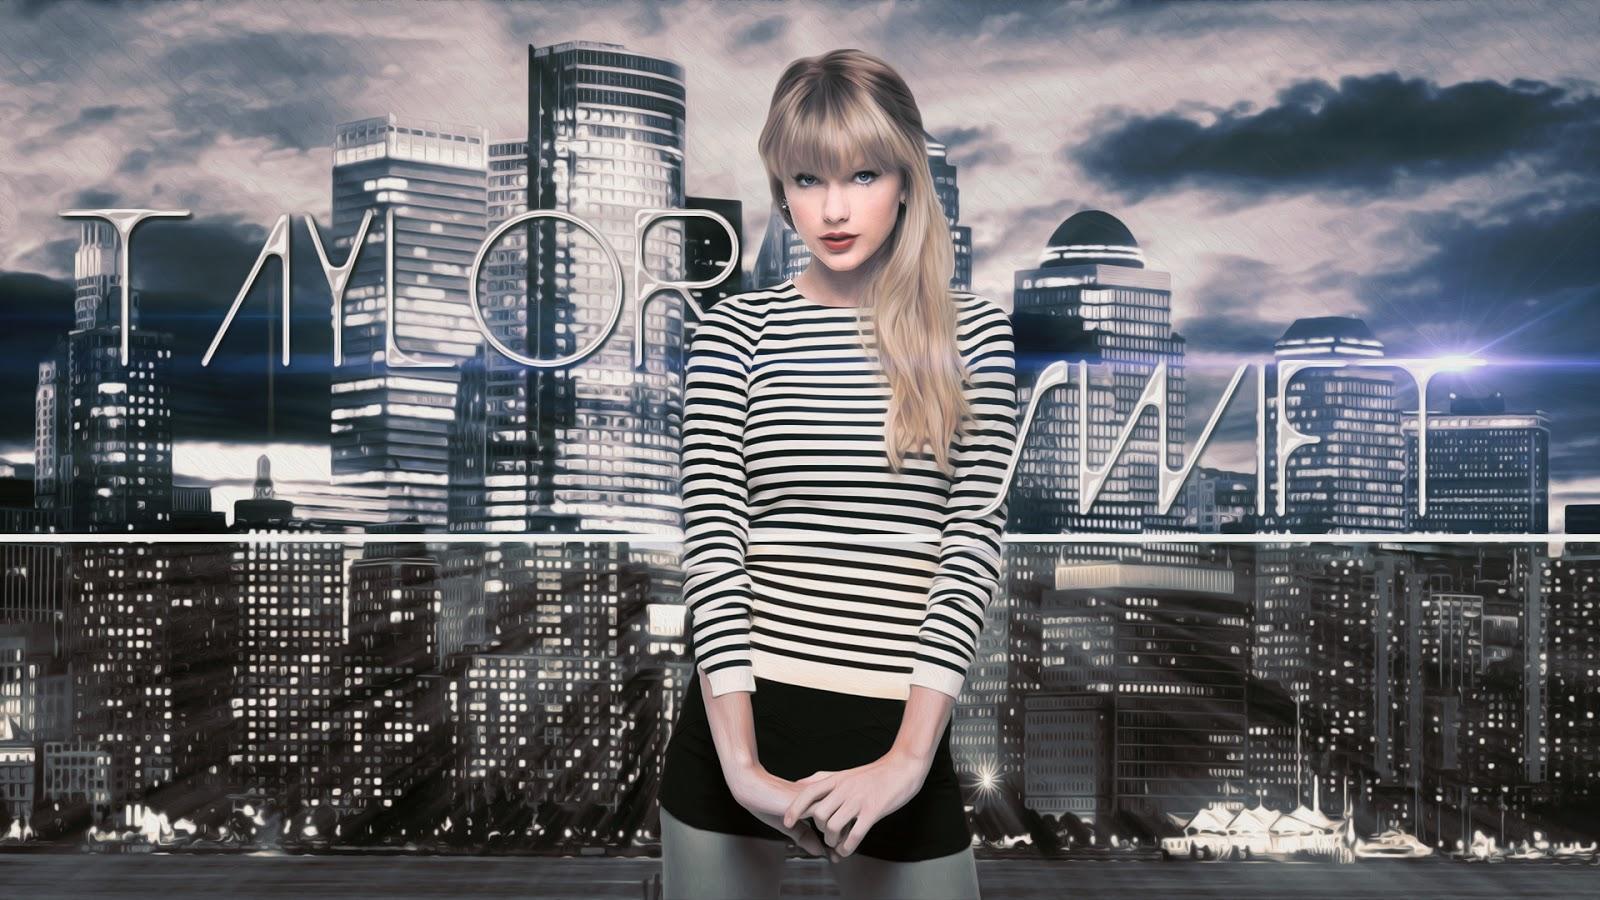 Calvin Johnson Hd Wallpaper Words Celebrities Wallpapers Taylor Swift Brand New